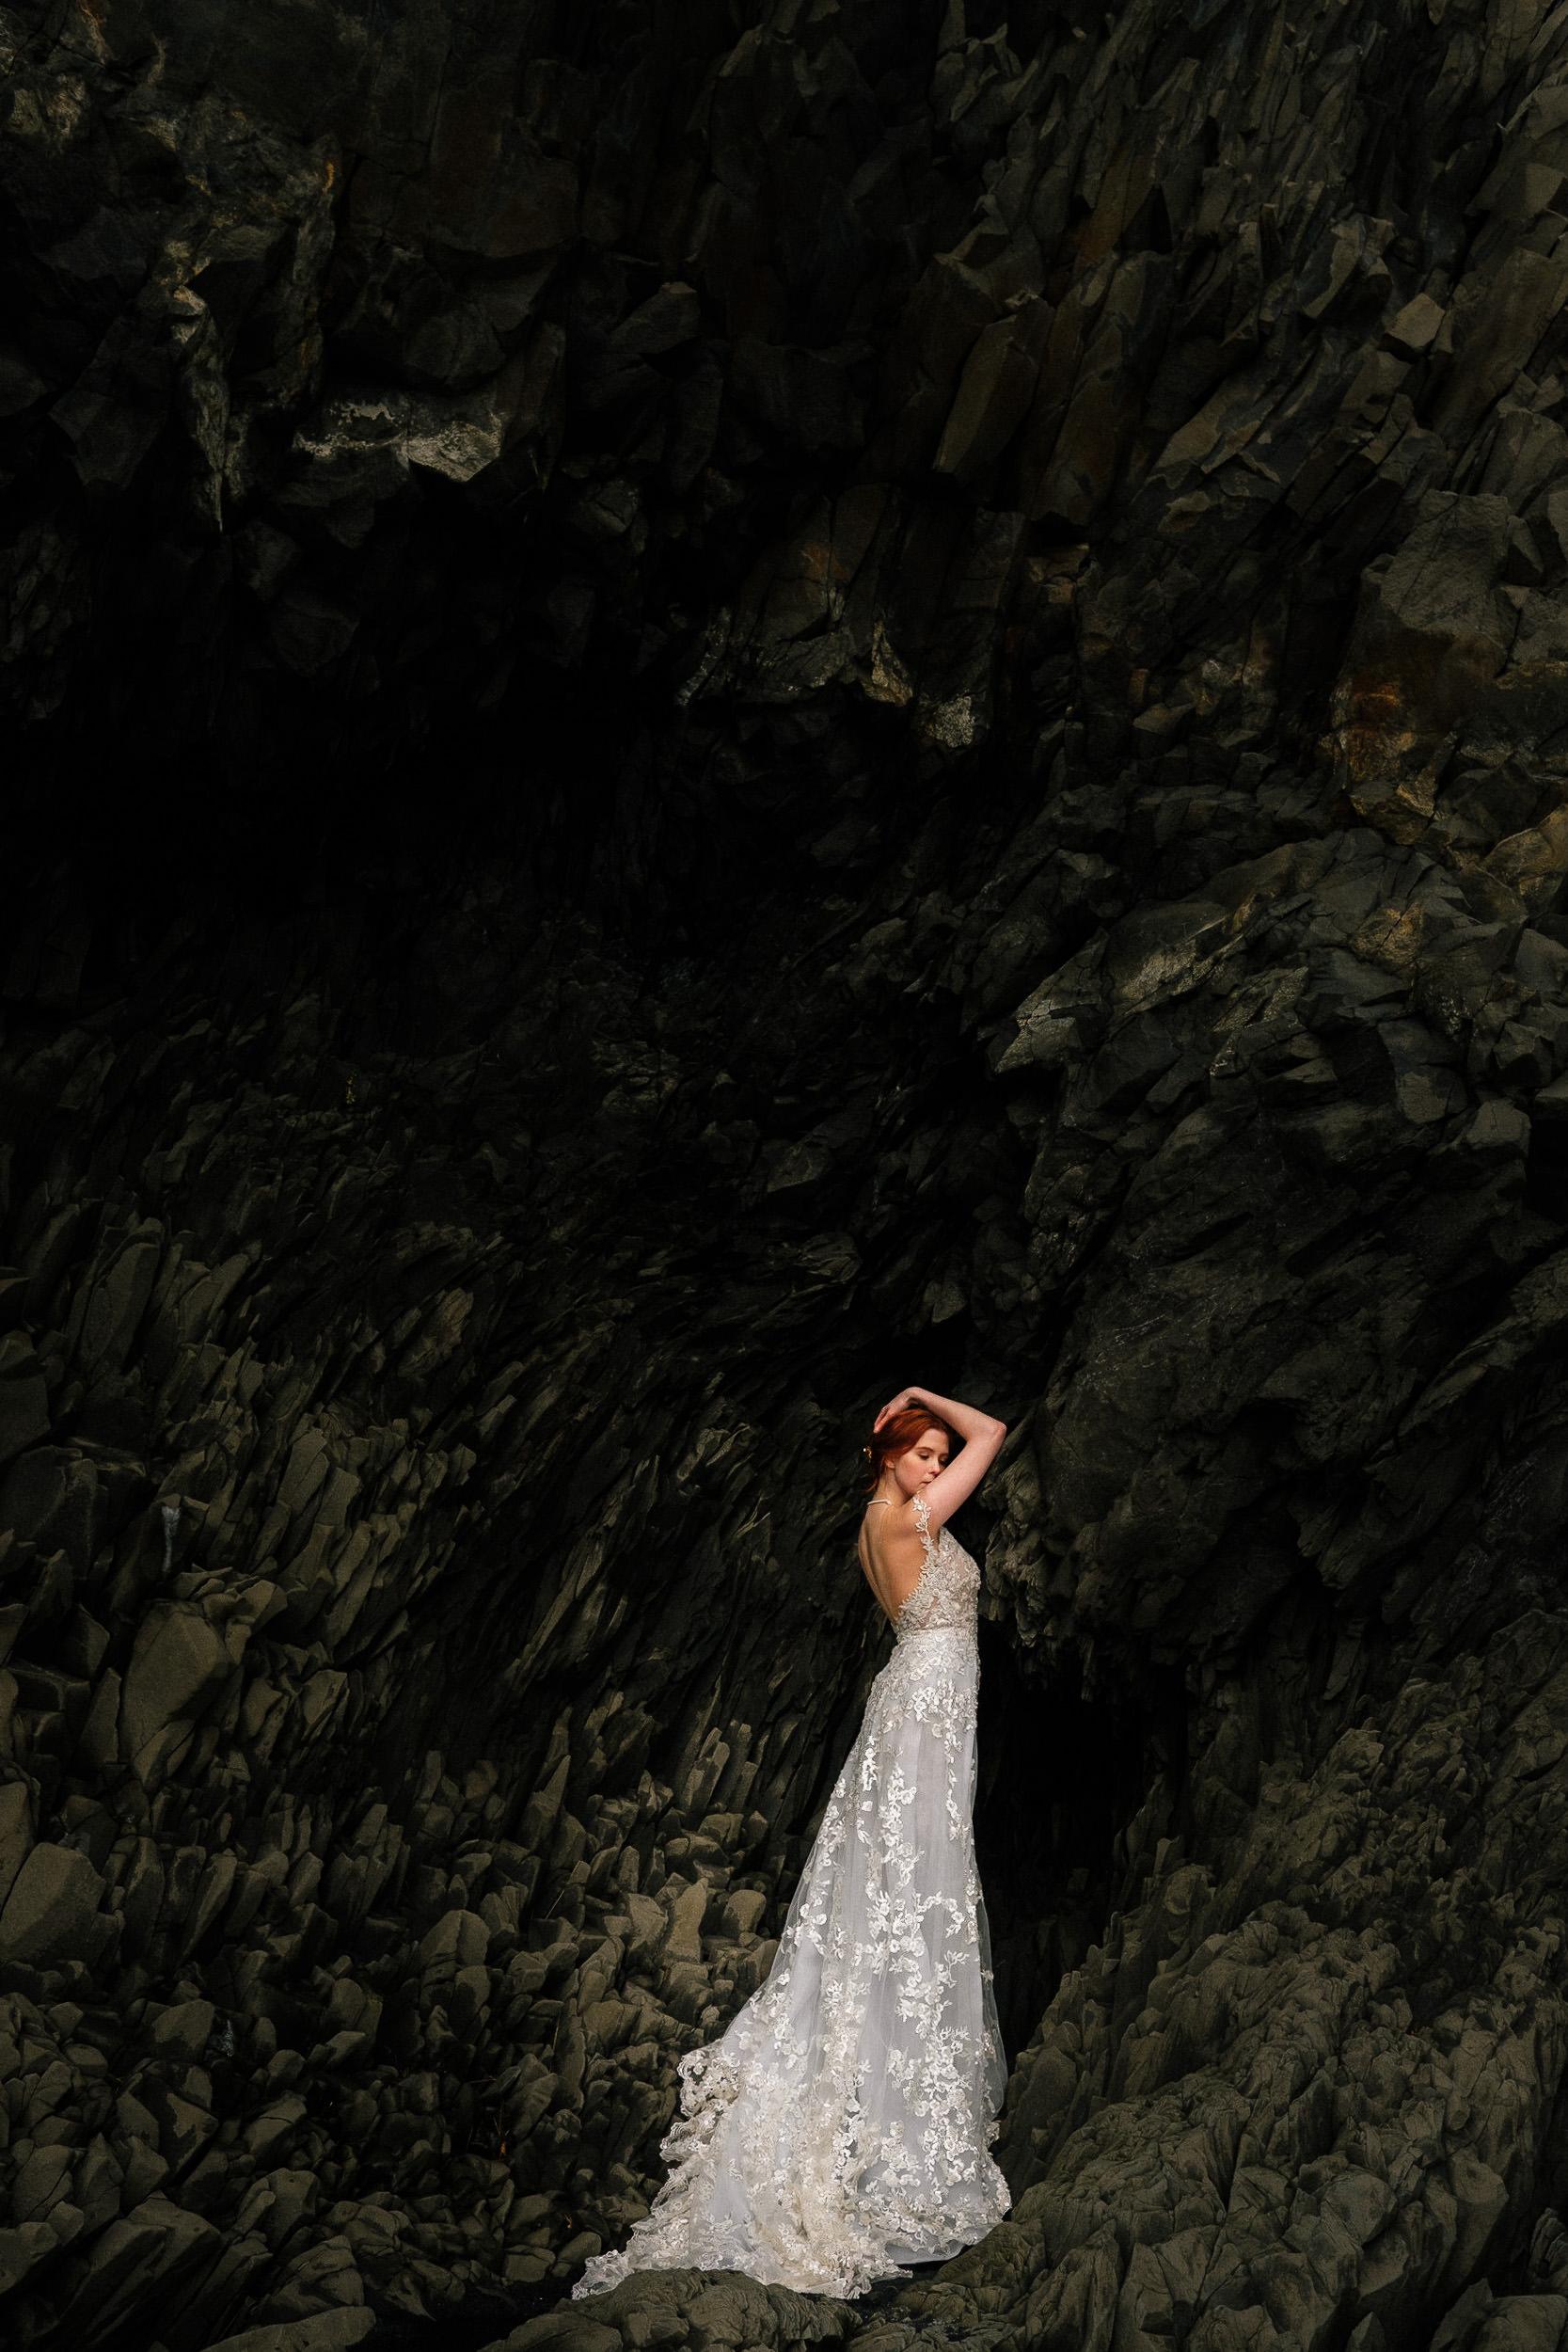 Collective_Wander_Iceland_Photographers_Trip_049.jpg